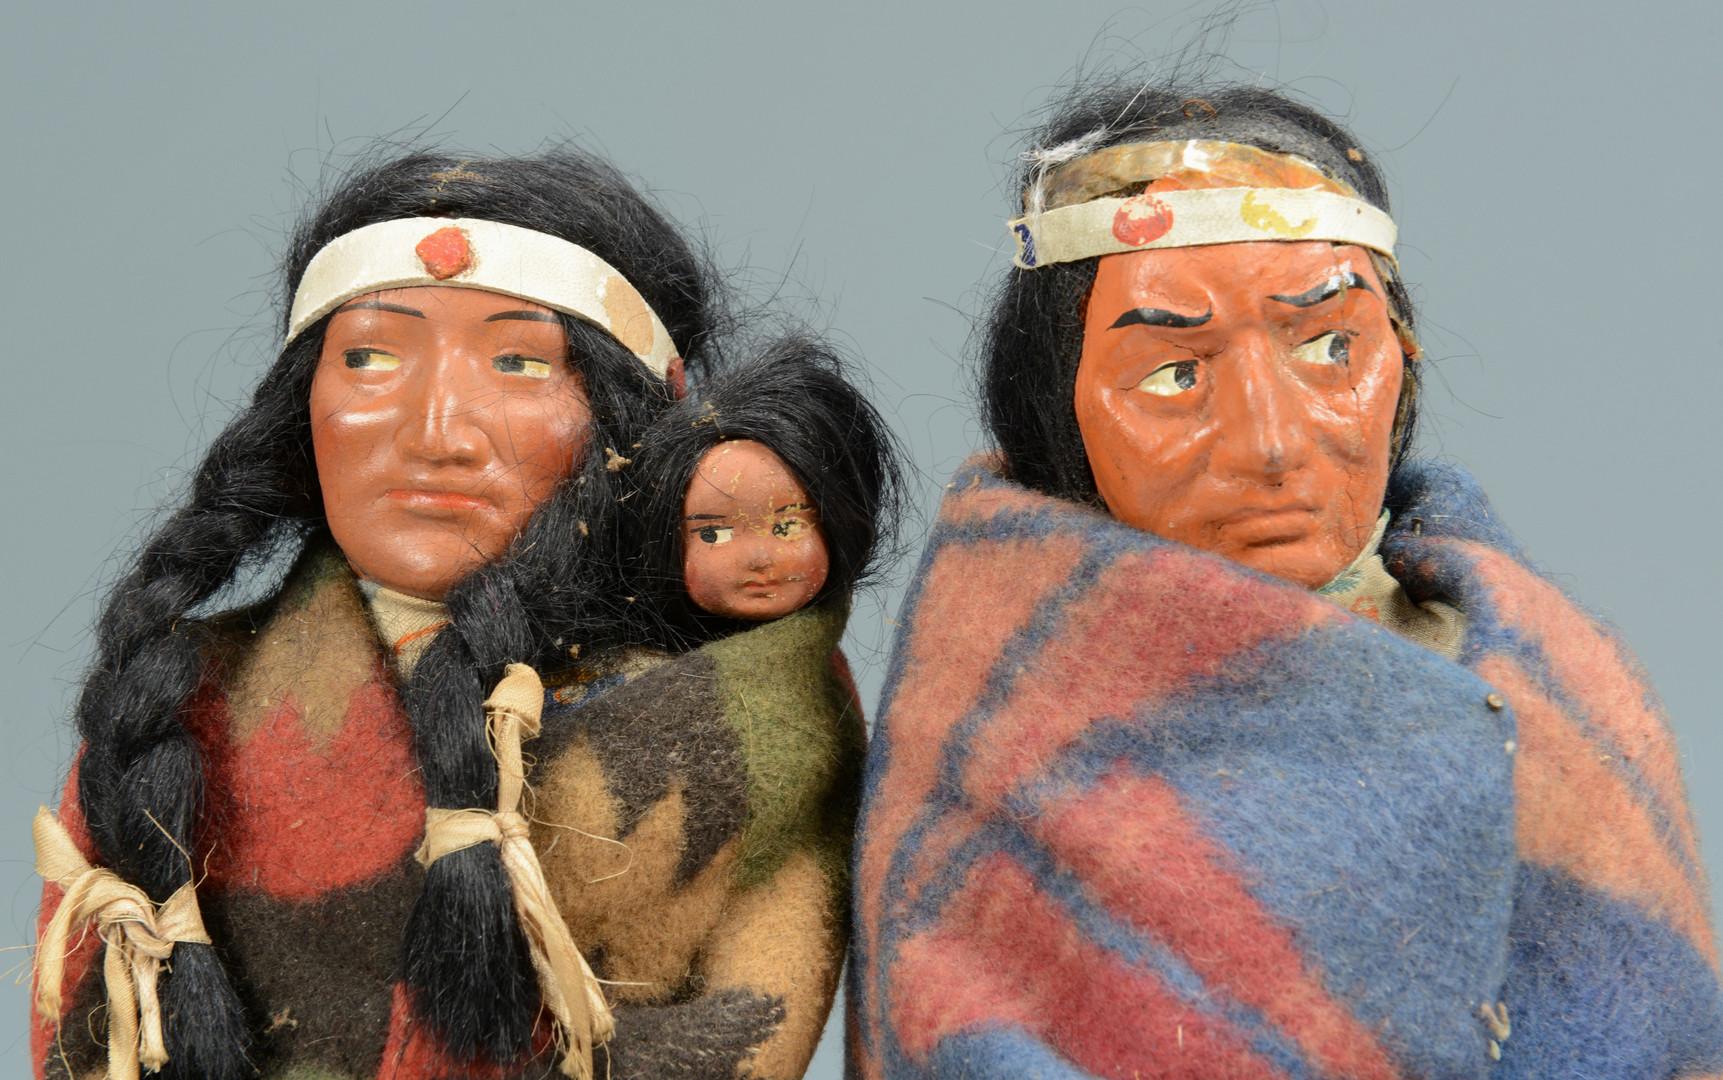 Lot 903: Grouping of 4 Skookum Dolls